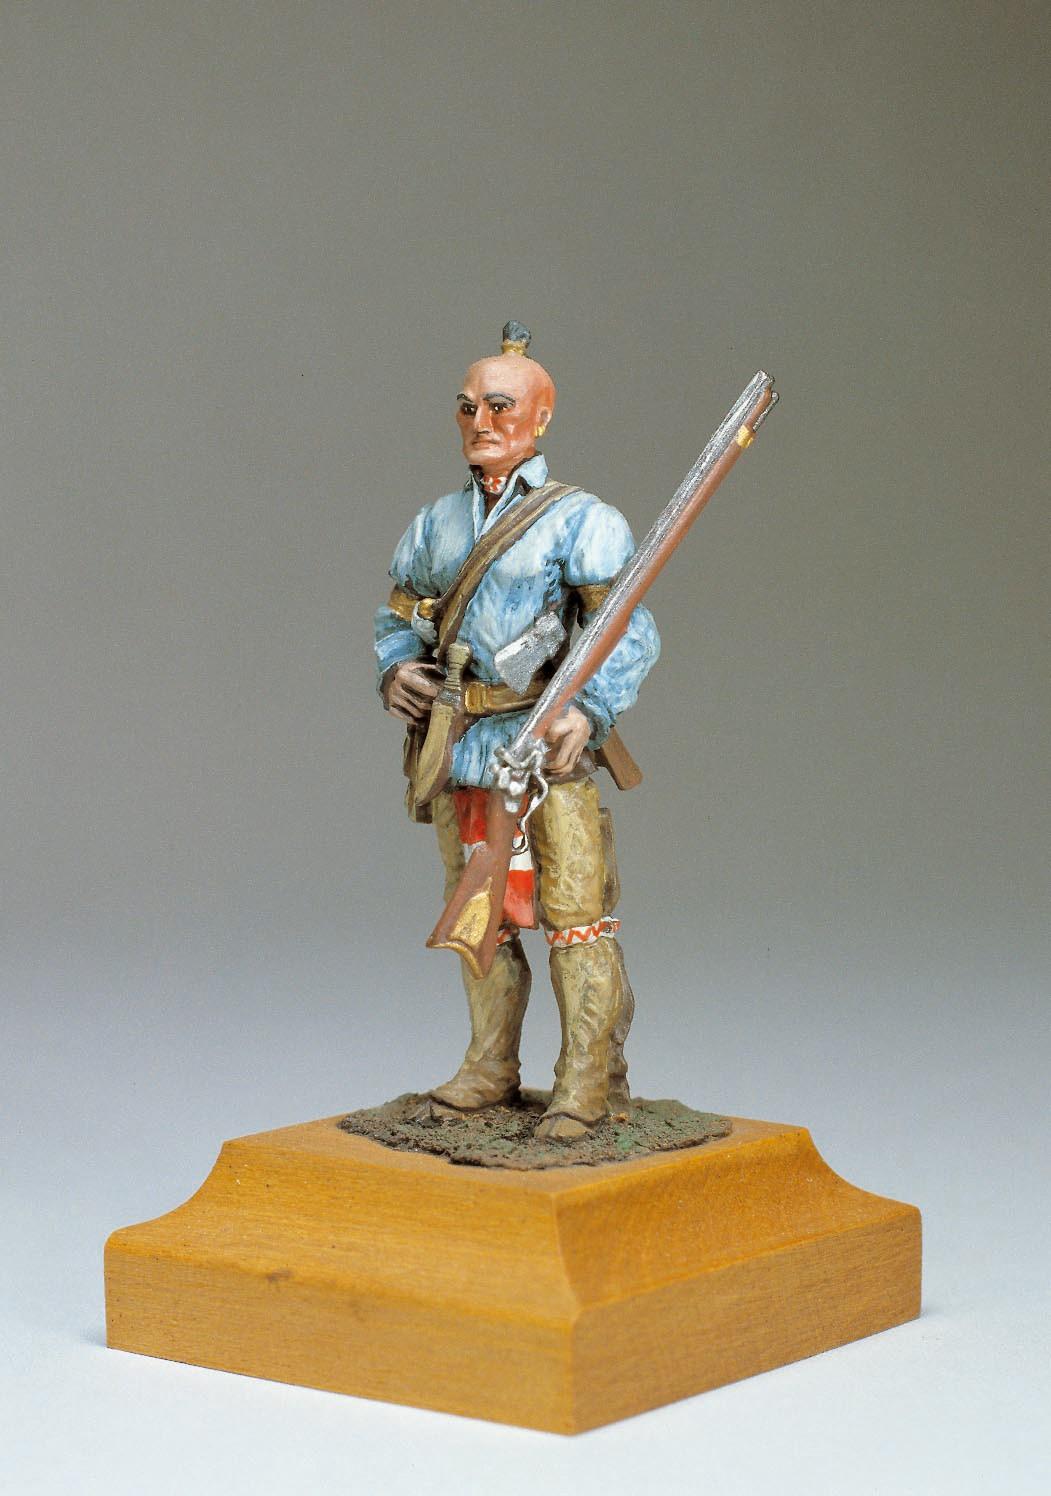 Mohican Warrior Figurine, 1759 (Amati)